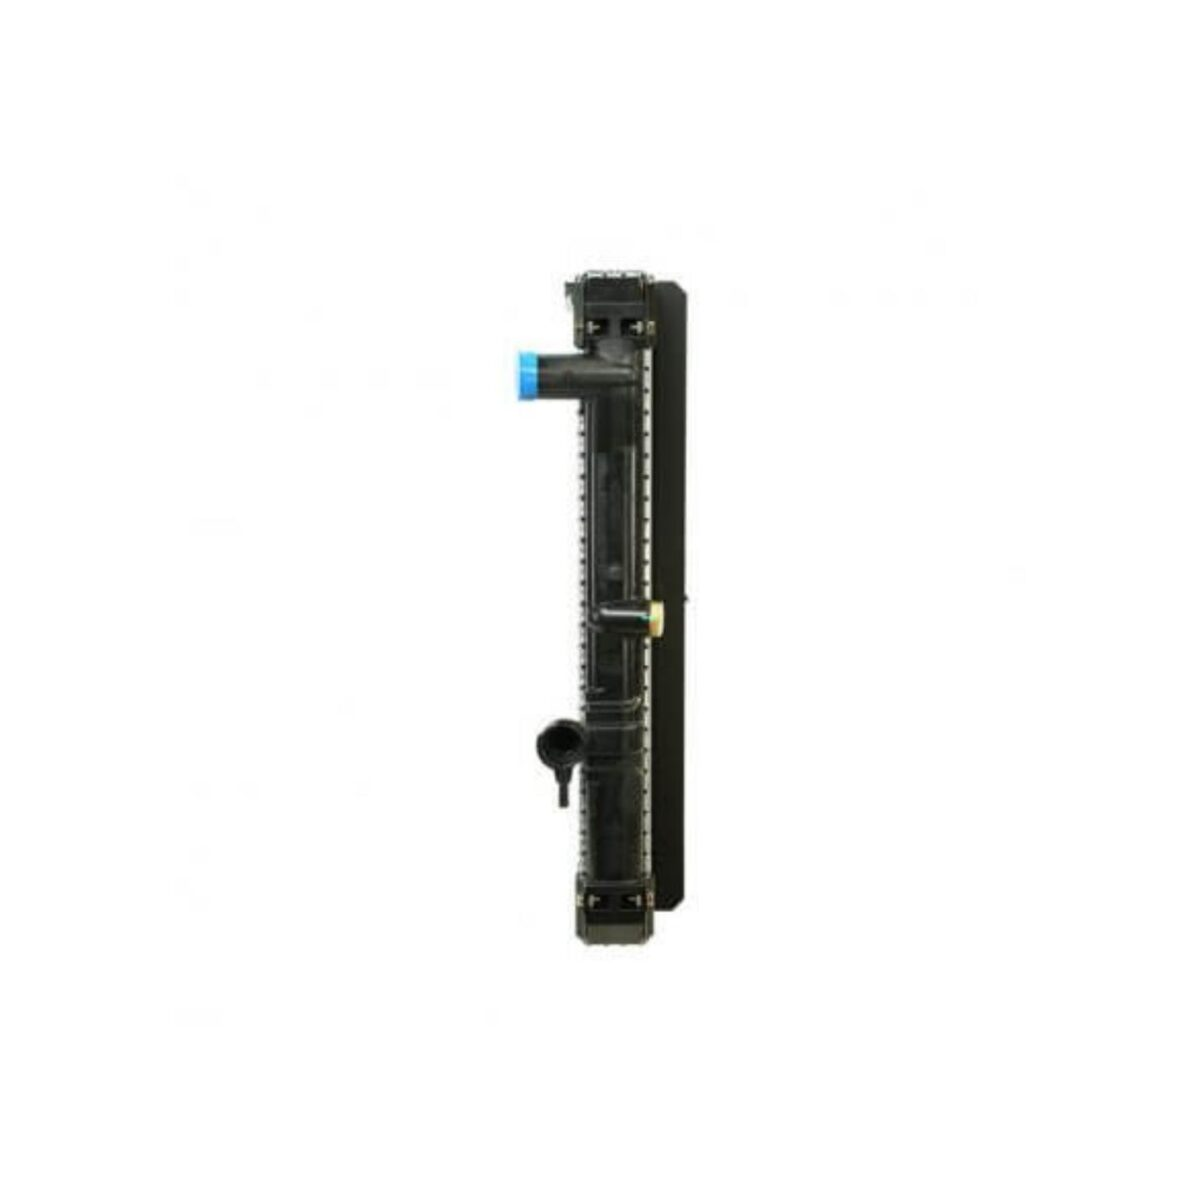 isuzu npr nqr series w diesel engine 99 04 radiator oem 5874107841 8